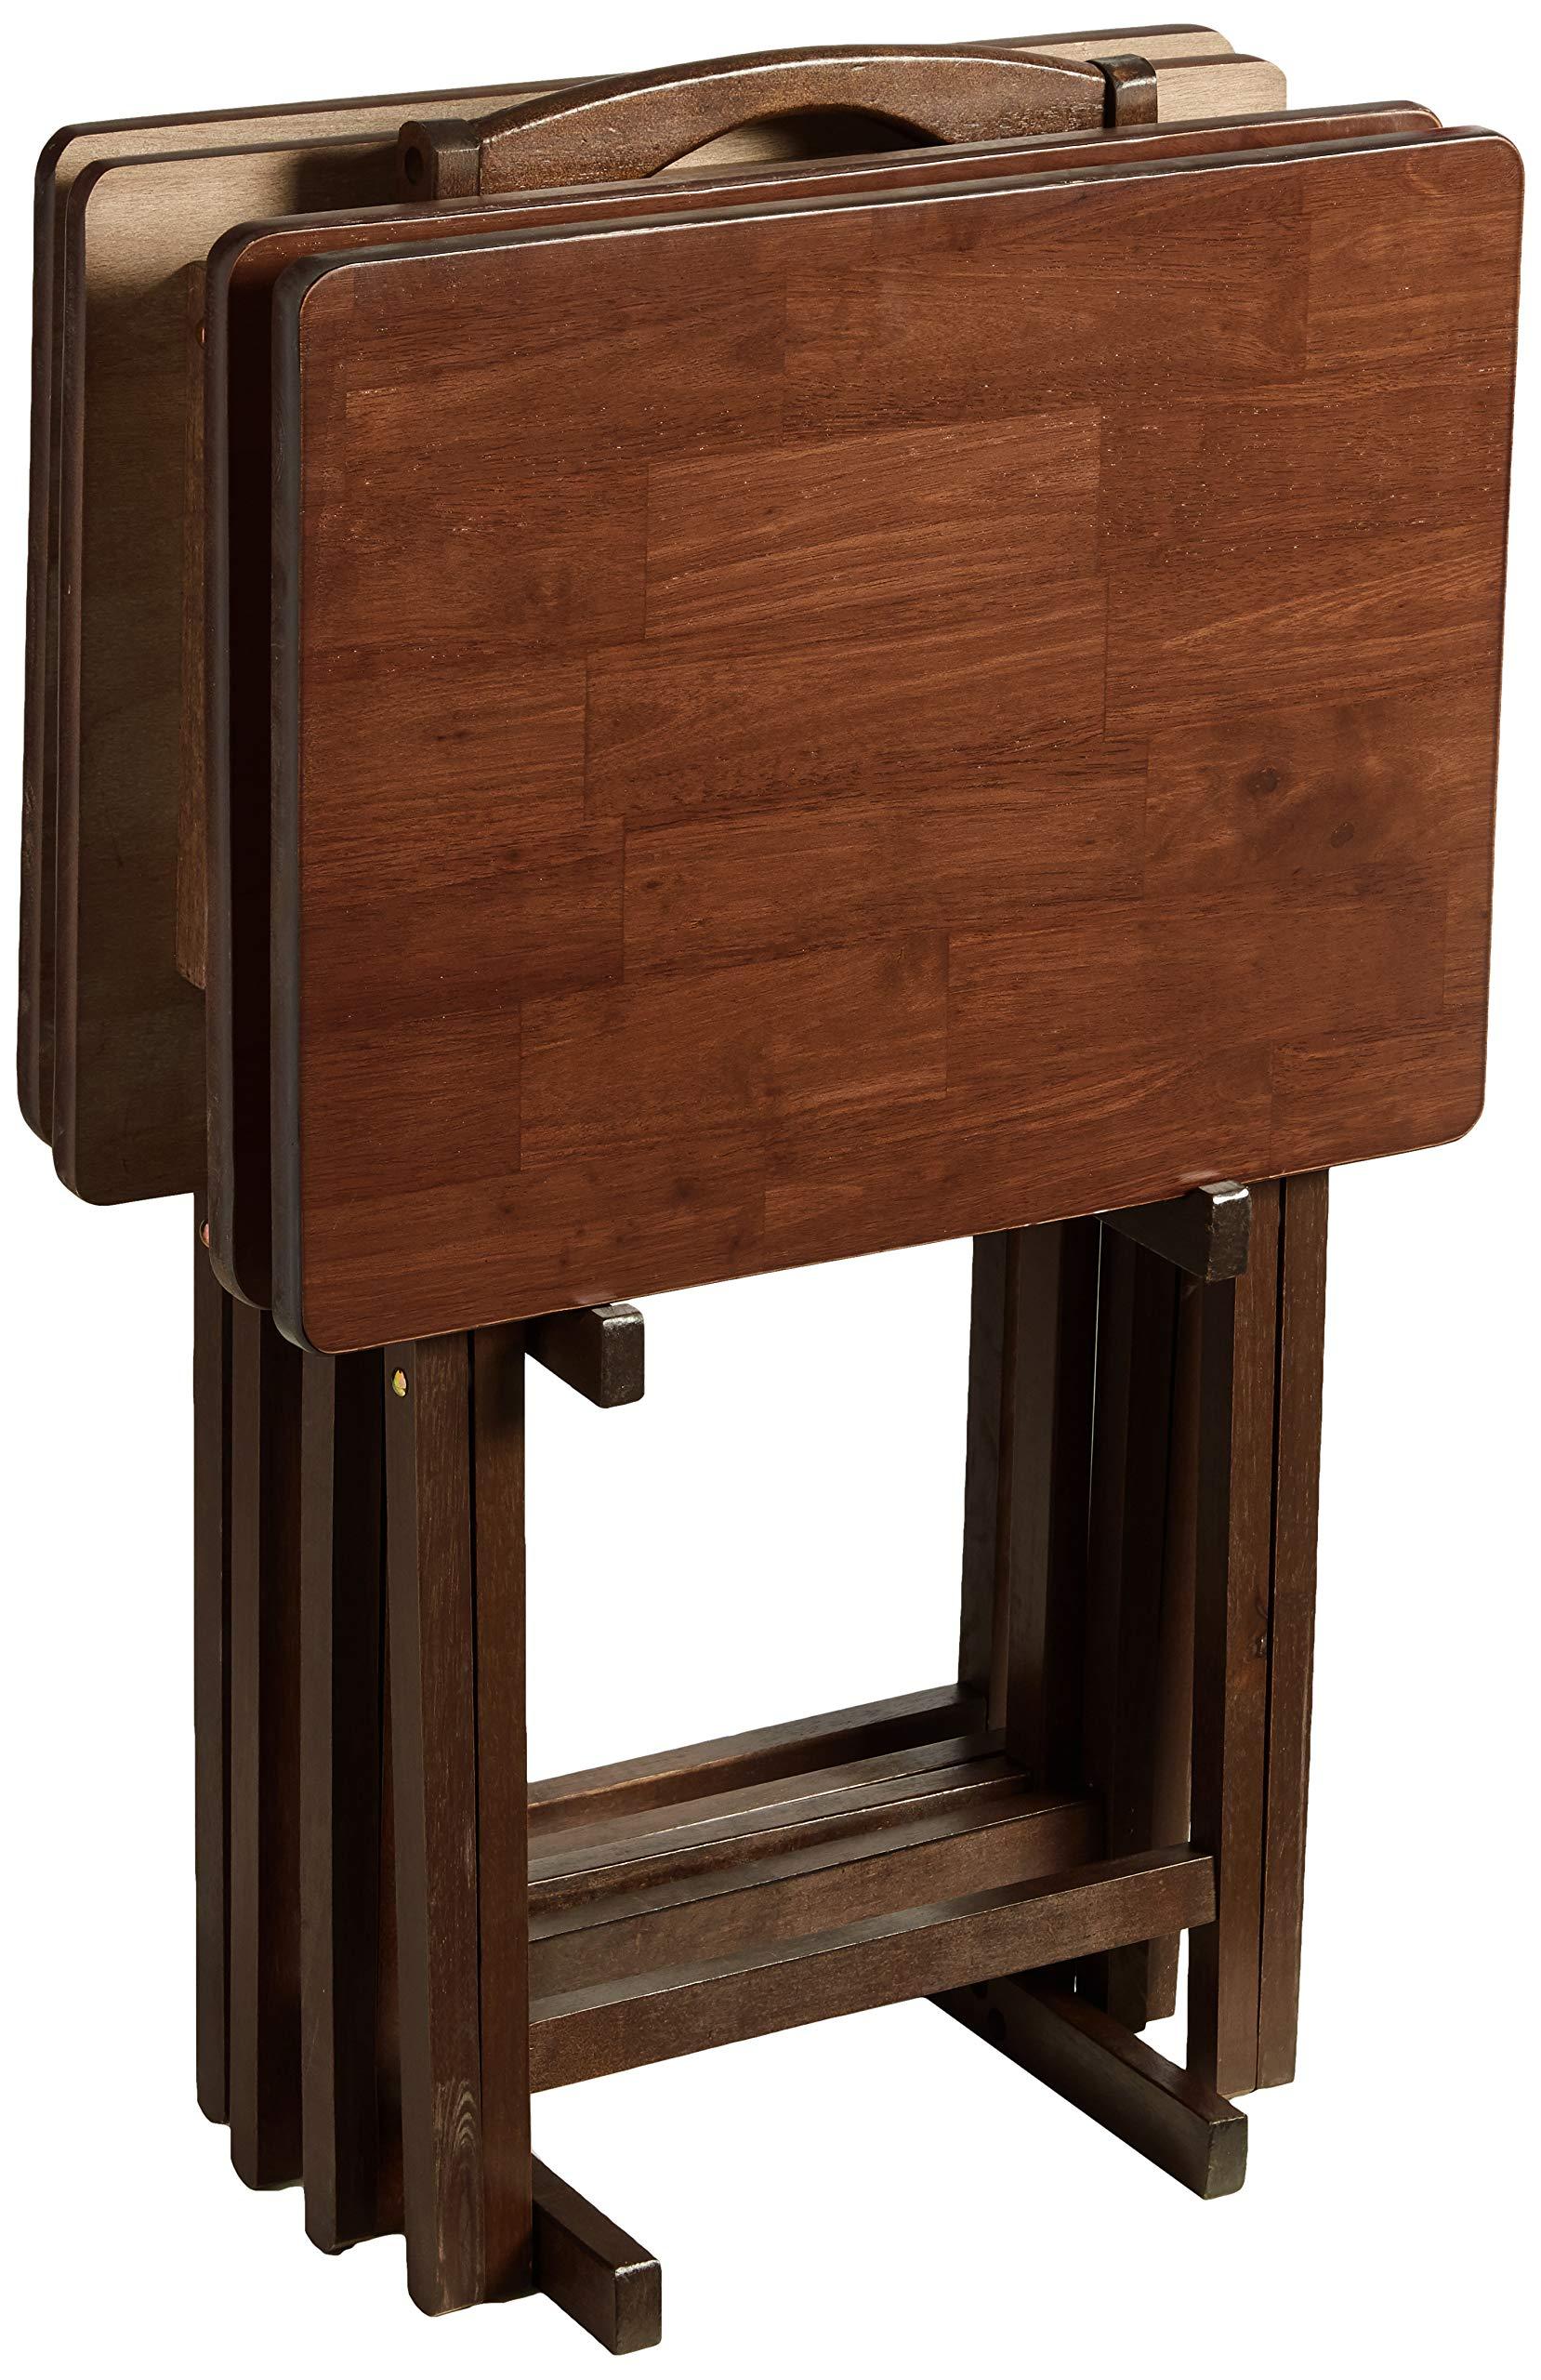 PJ Wood 5-piece Folding TV Tray & Snack Table - Walnut by PJ Wood